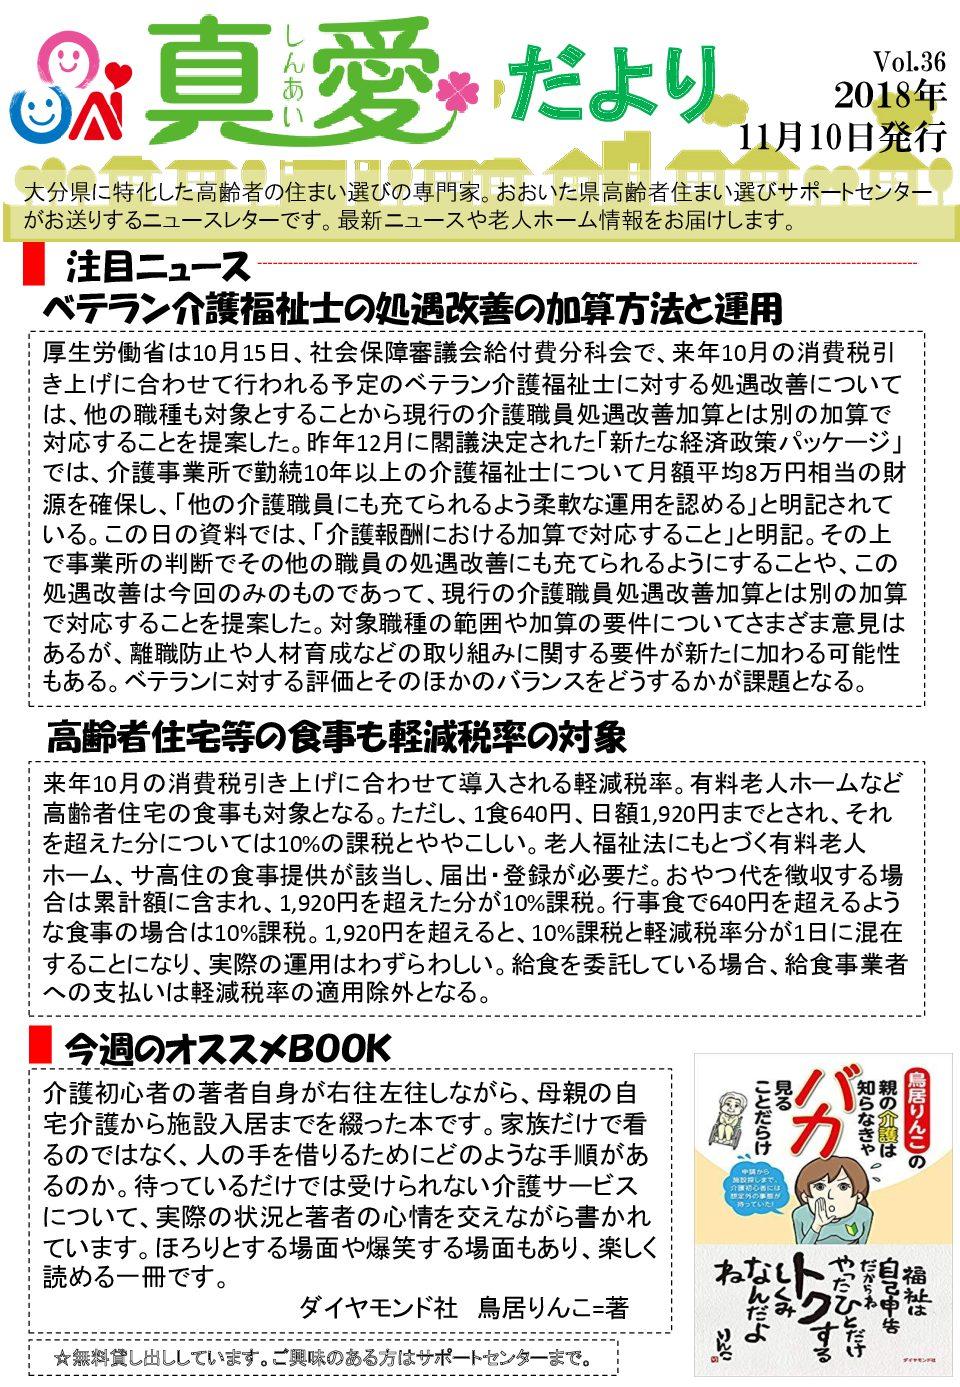 【Vol.36】 2018.11.10発行